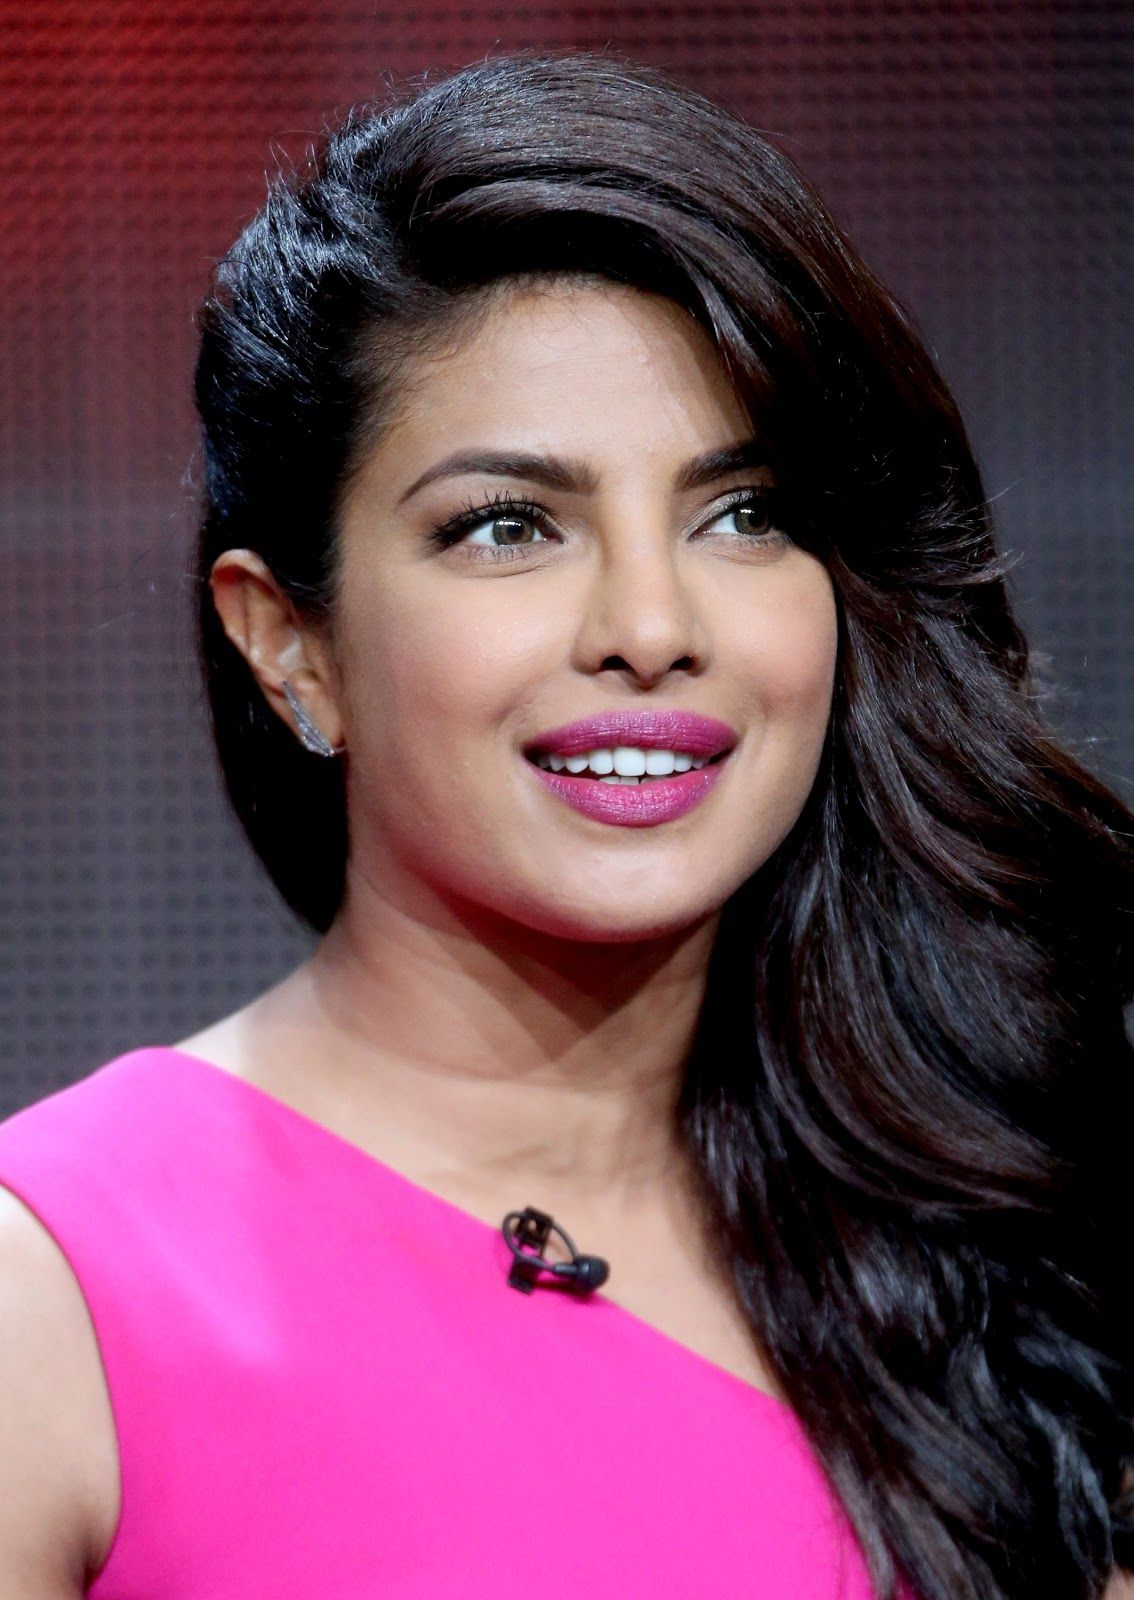 celebrity hd images: priyanka chopra on the sets of 'quantico' - hd